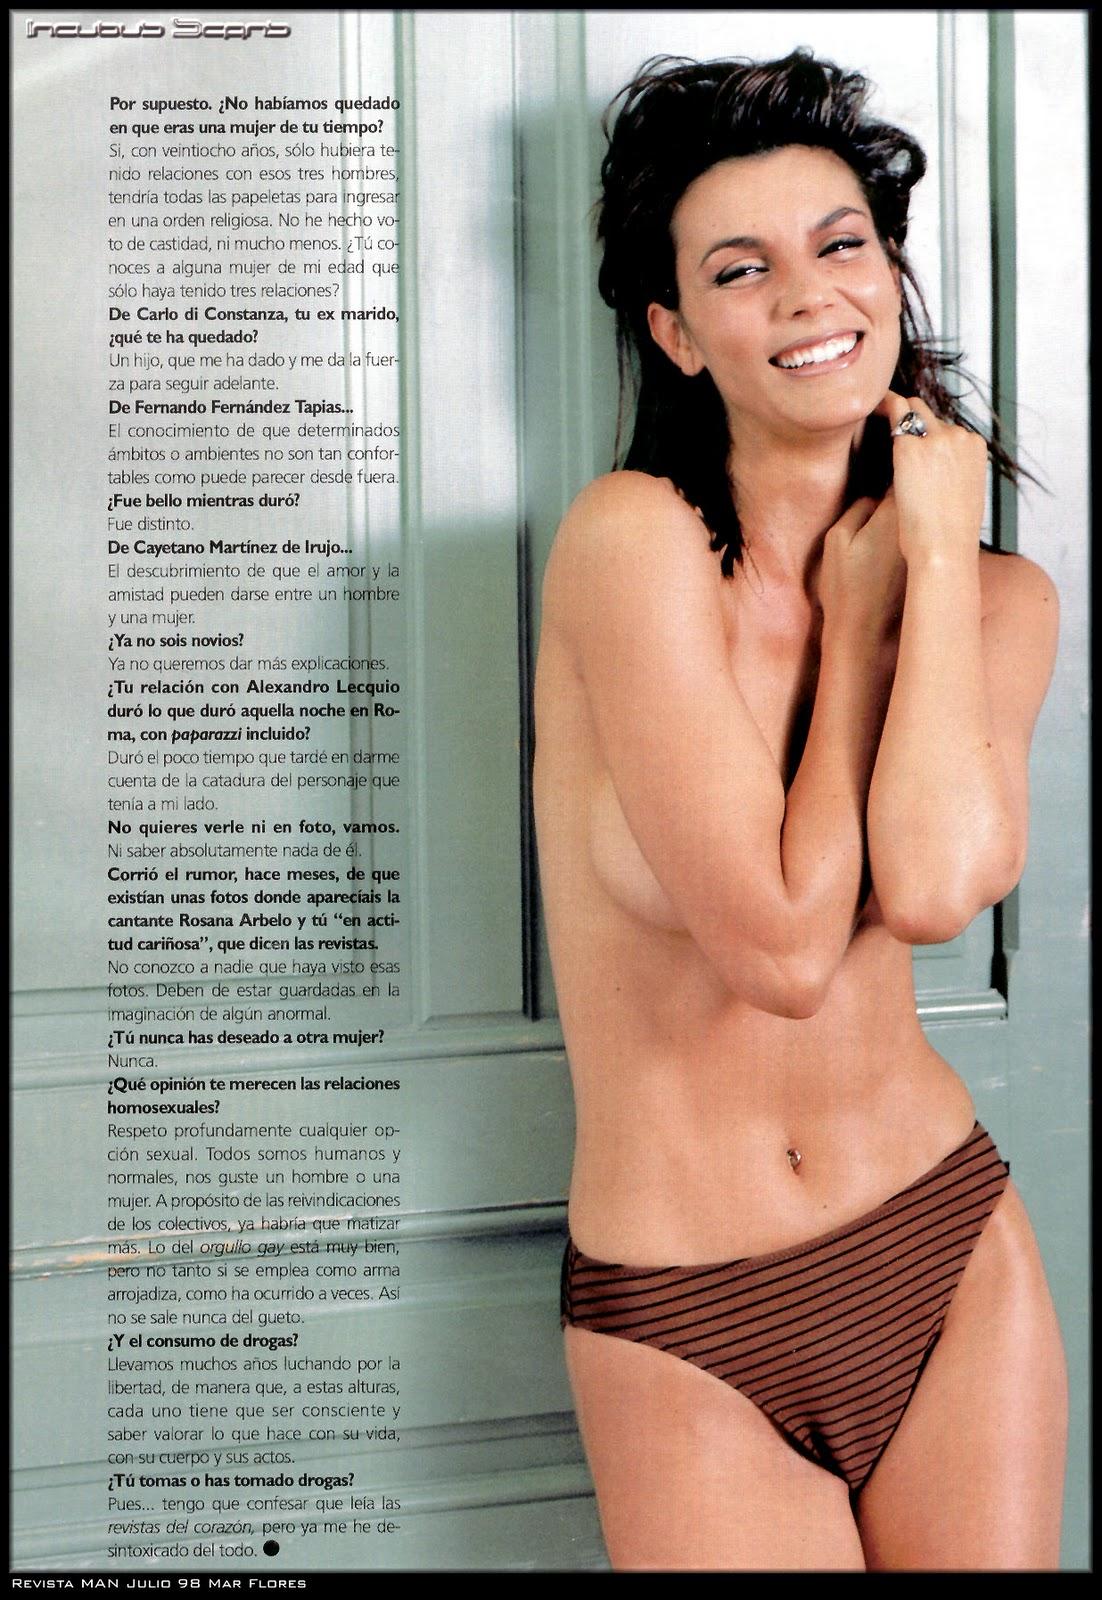 Famosas espanolas desnudas